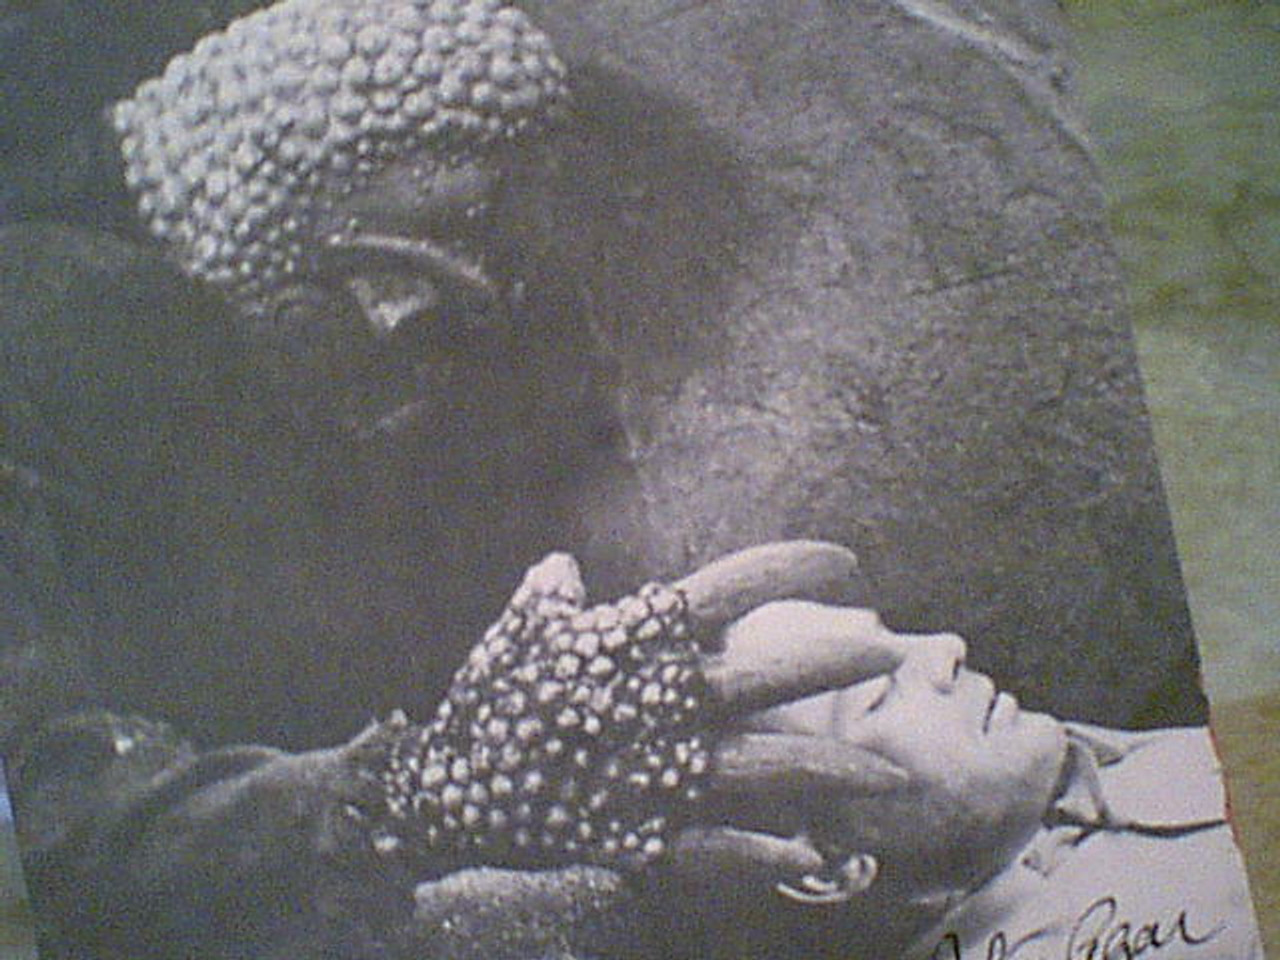 Agar, John The Mole People Movie Scene Photo Signed Autograph